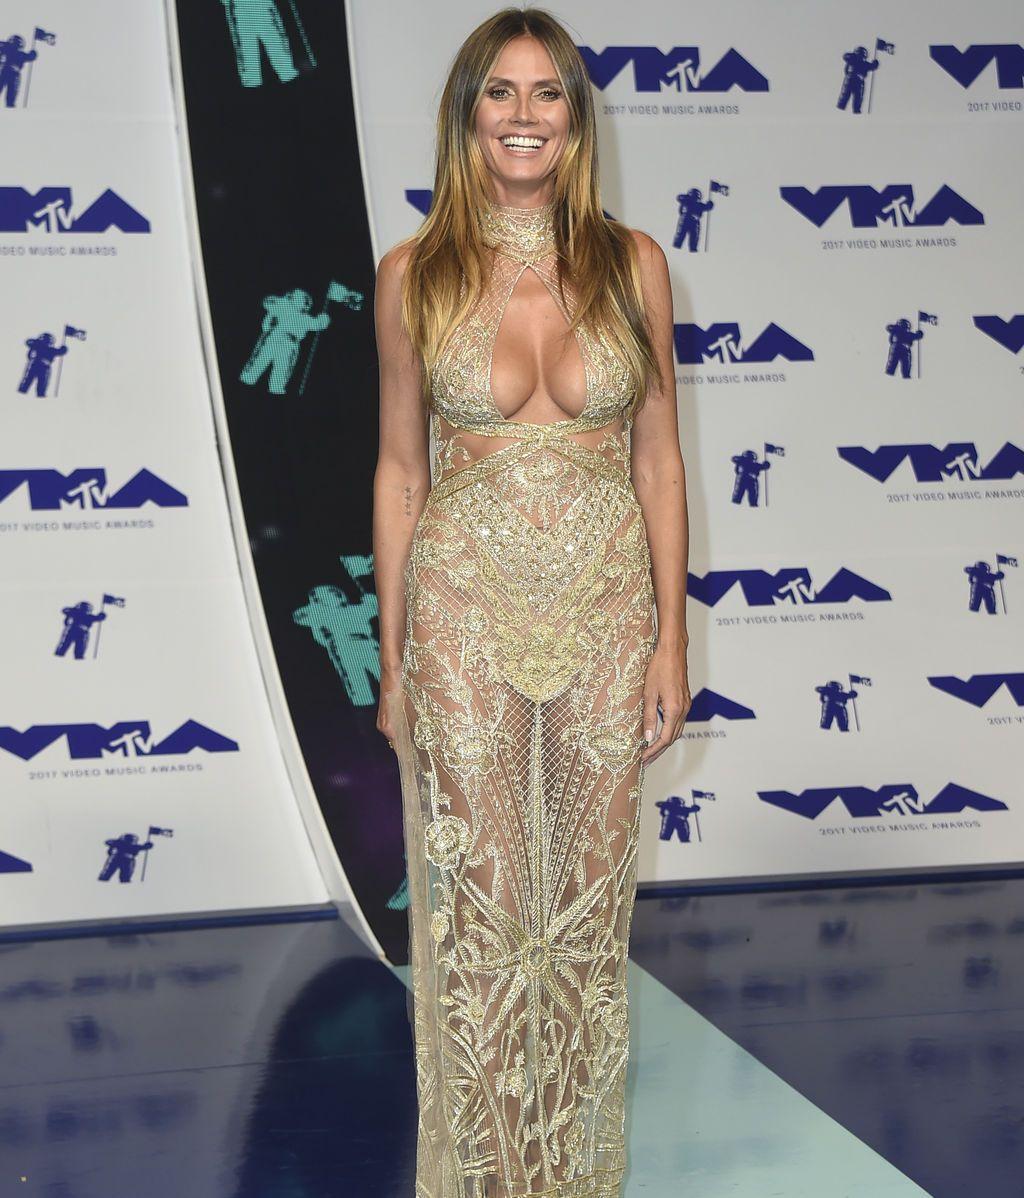 Heidi Klum eligió un vestido con transparencias firmado por Dundas